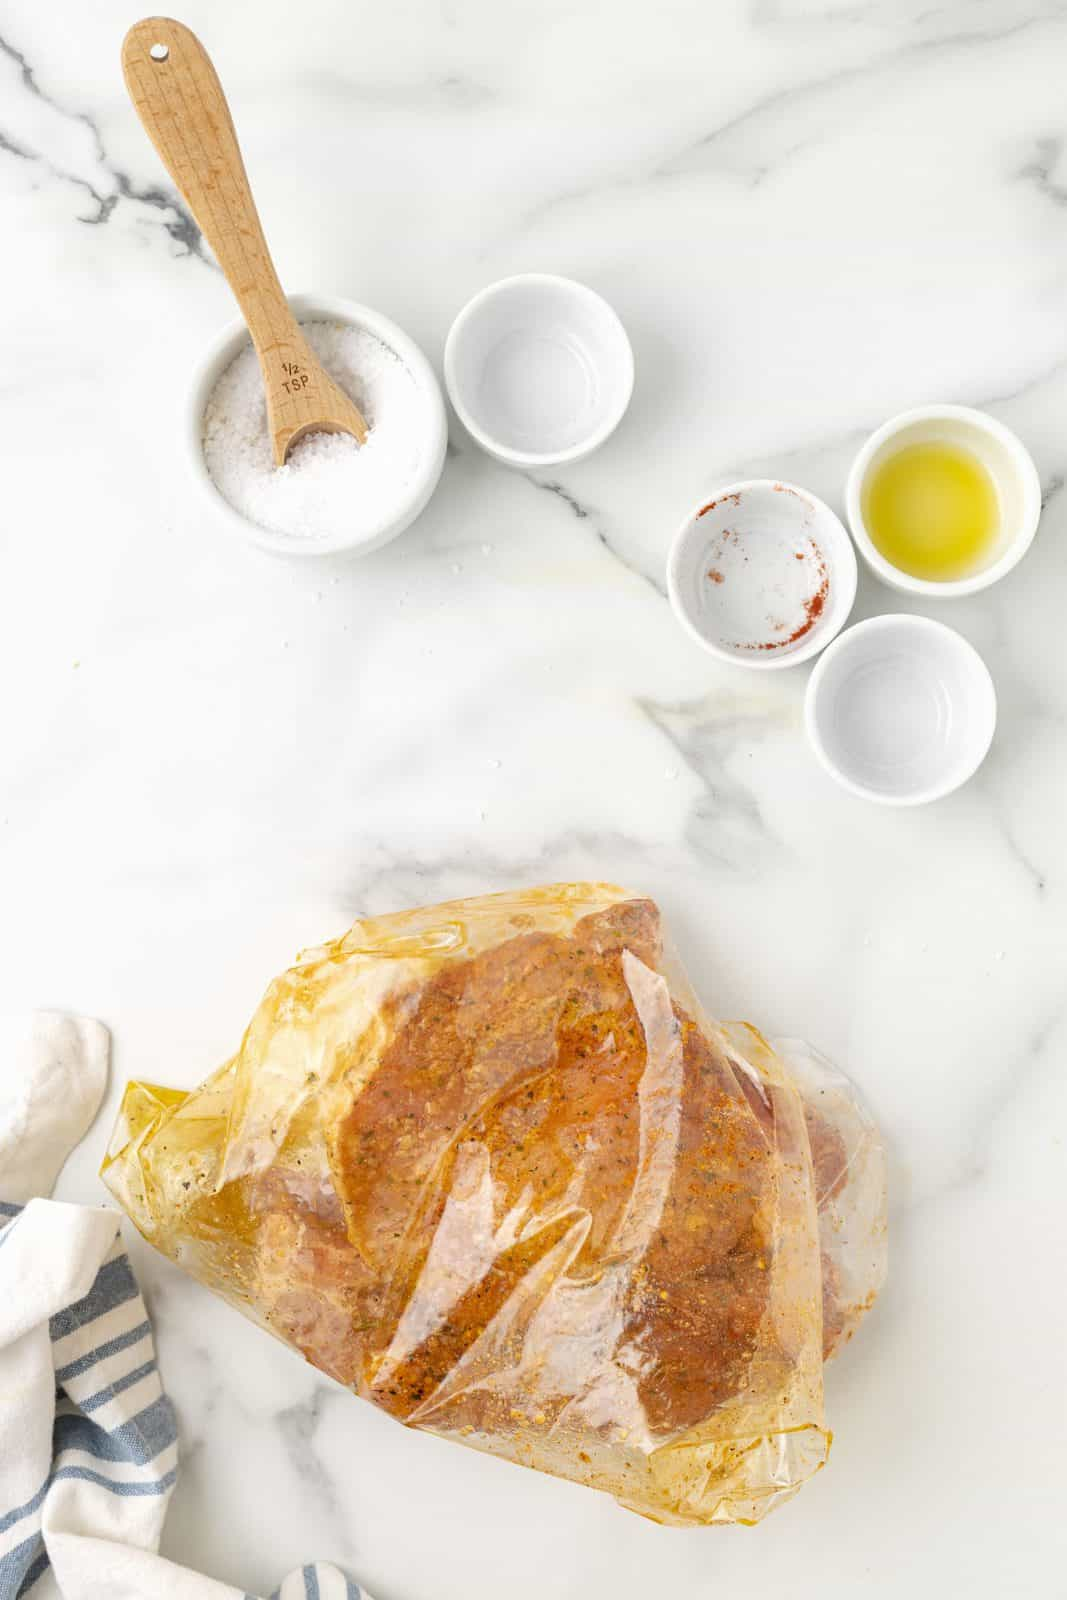 Pork chops shaken up with ingredients in bag to coat.